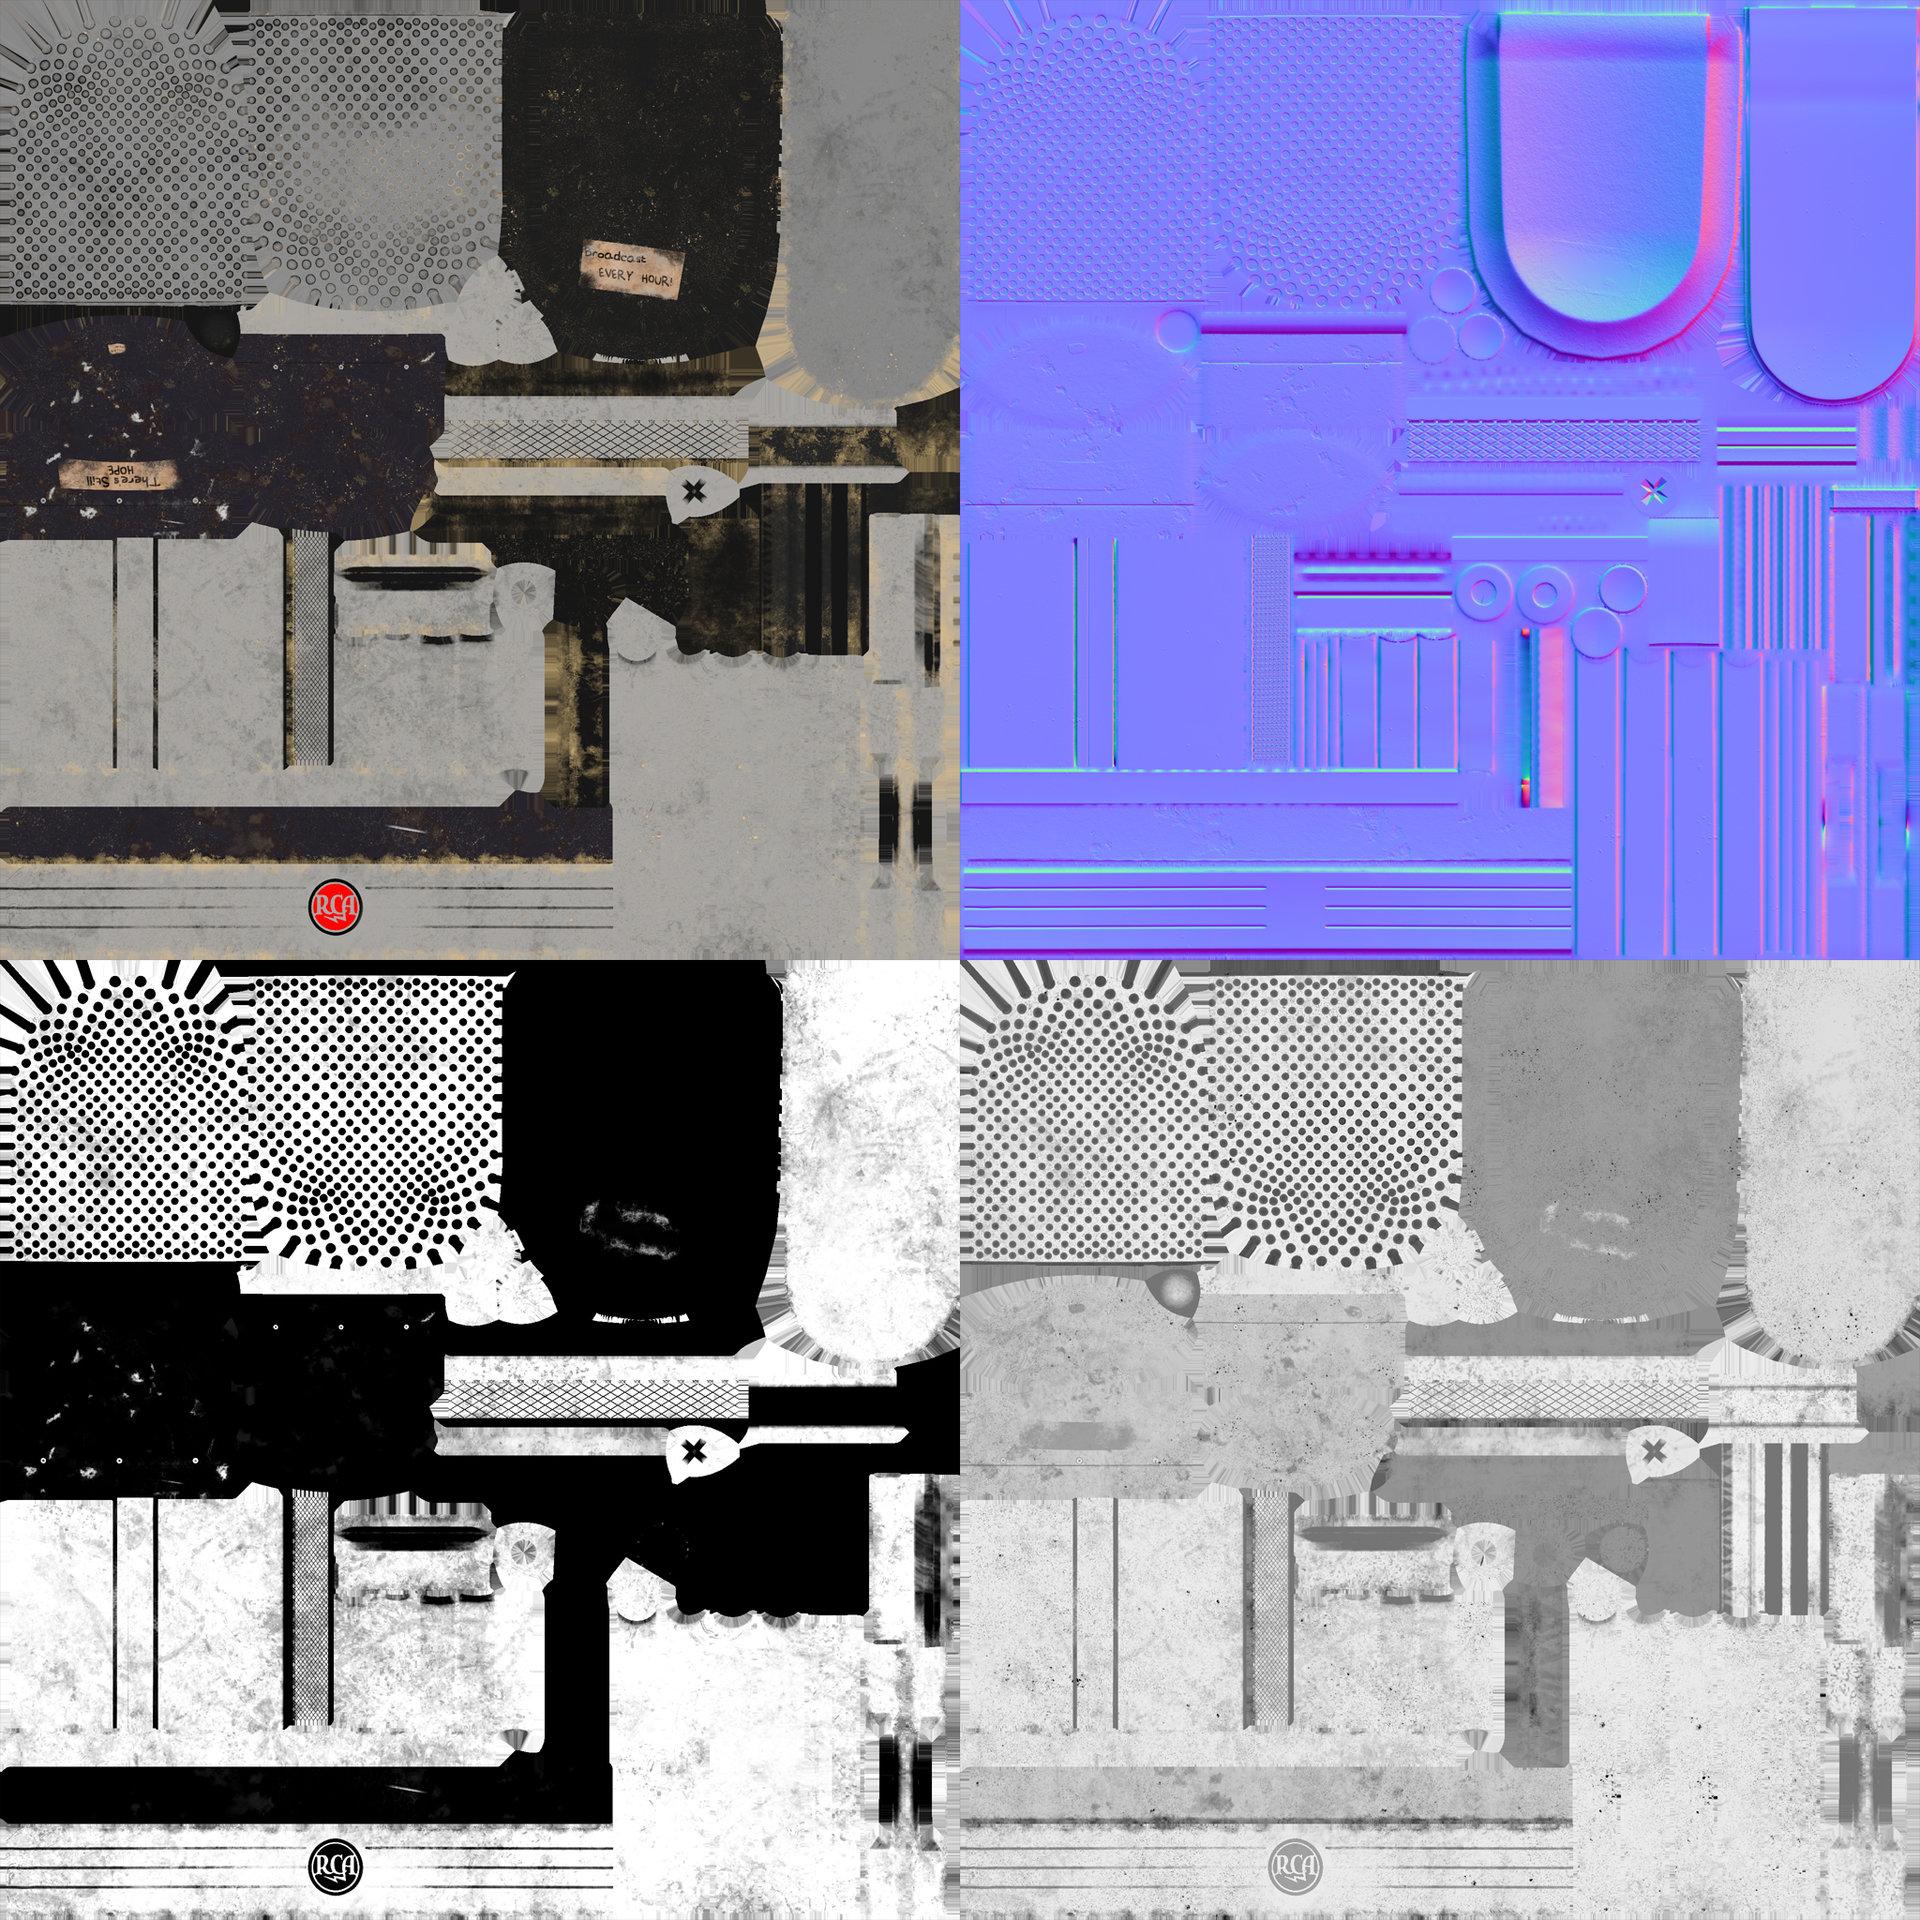 giovanni-martinez-radio-mic-final-texture.jpg?1431045192